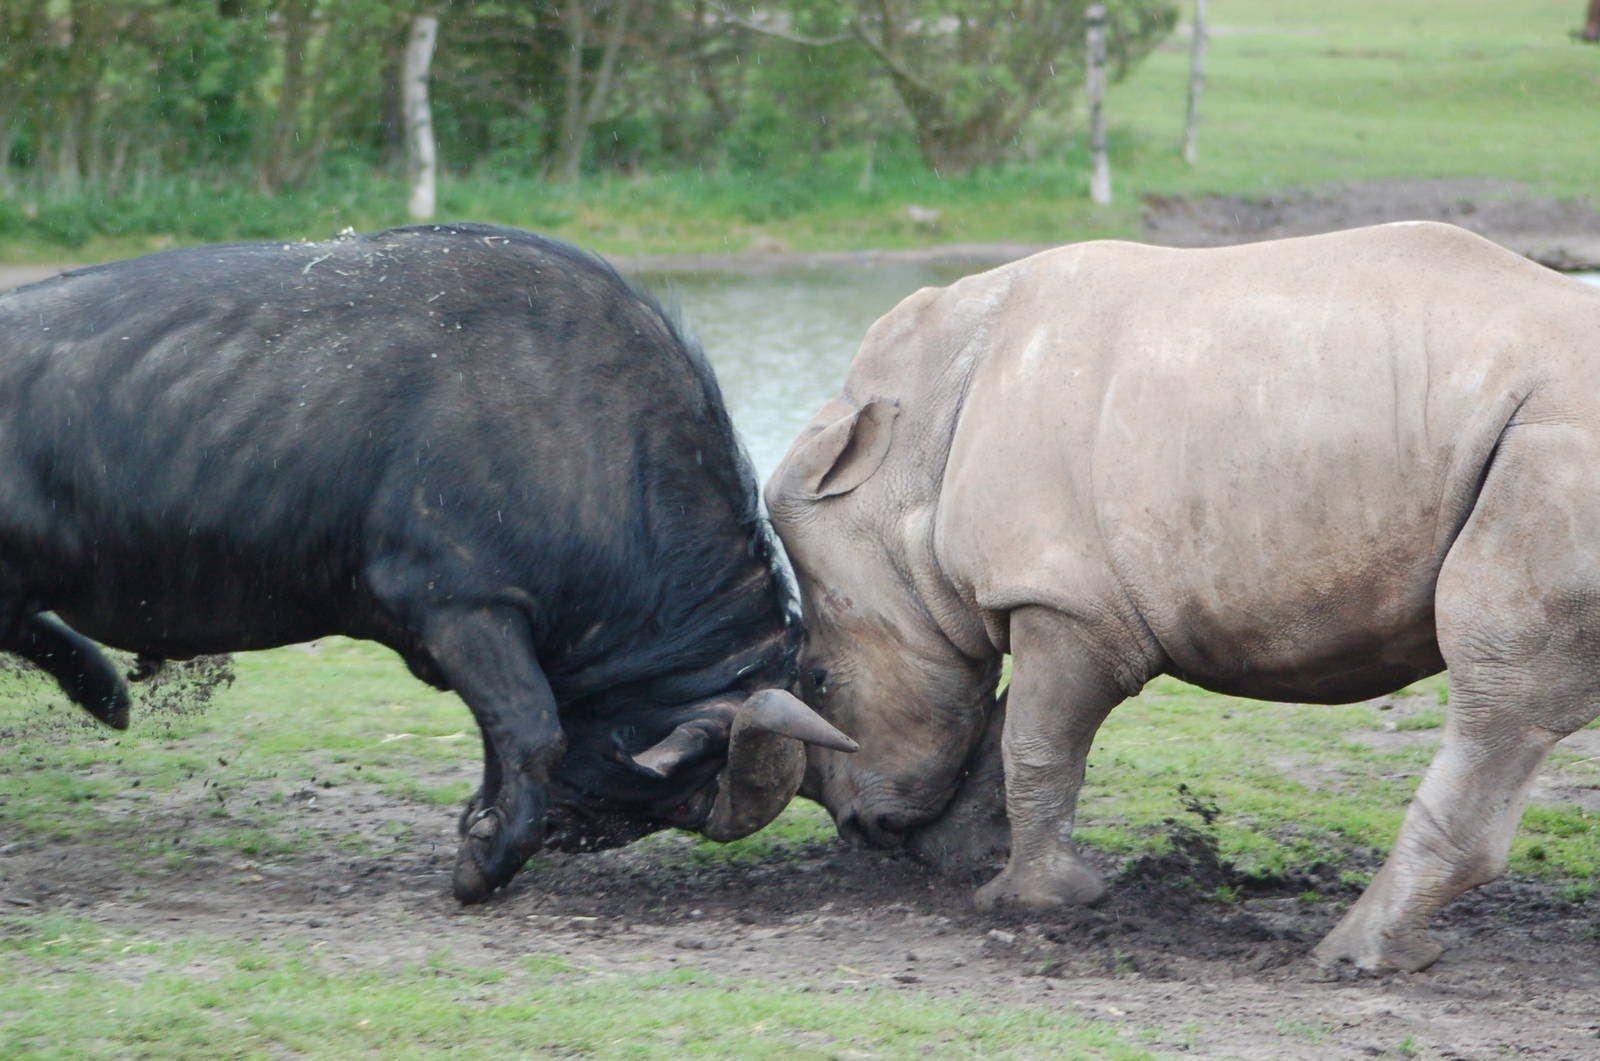 White rhino vs Cape Buffalo | Battle of the Big 5 | Animal